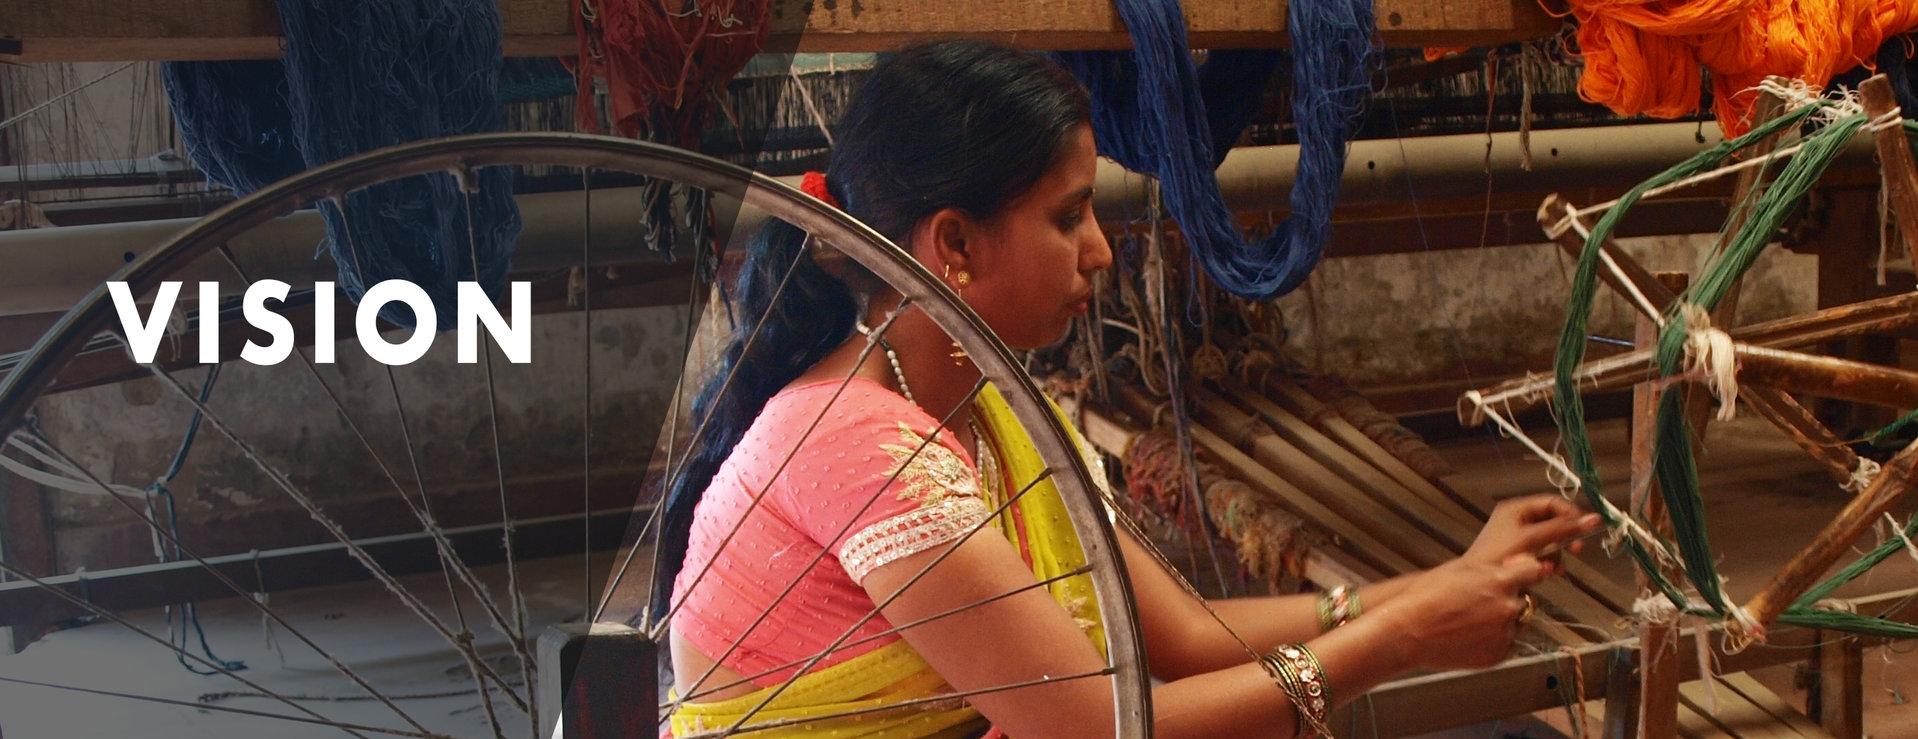 making yarn.jpg